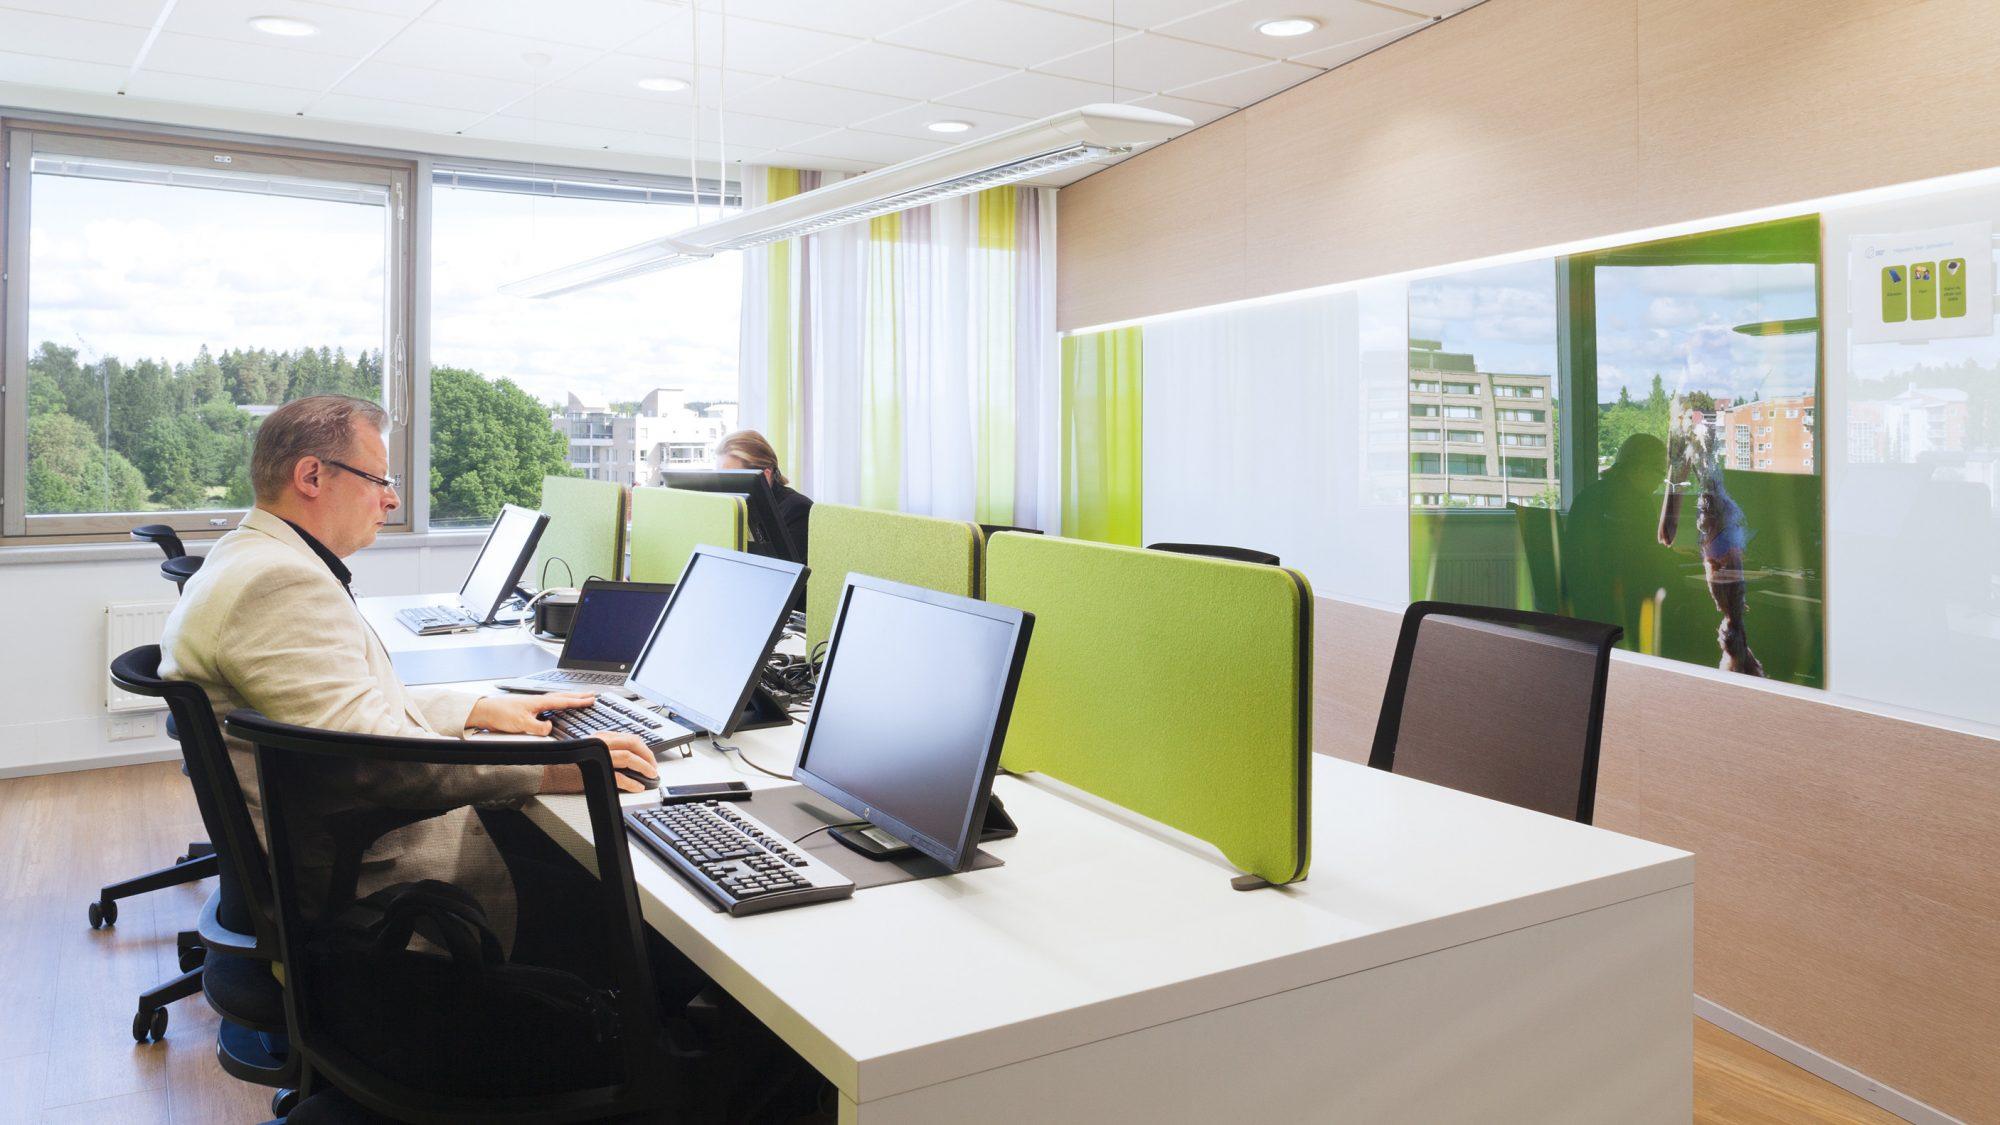 City-of-Espoo-Mayor's-office-GI-Project-3